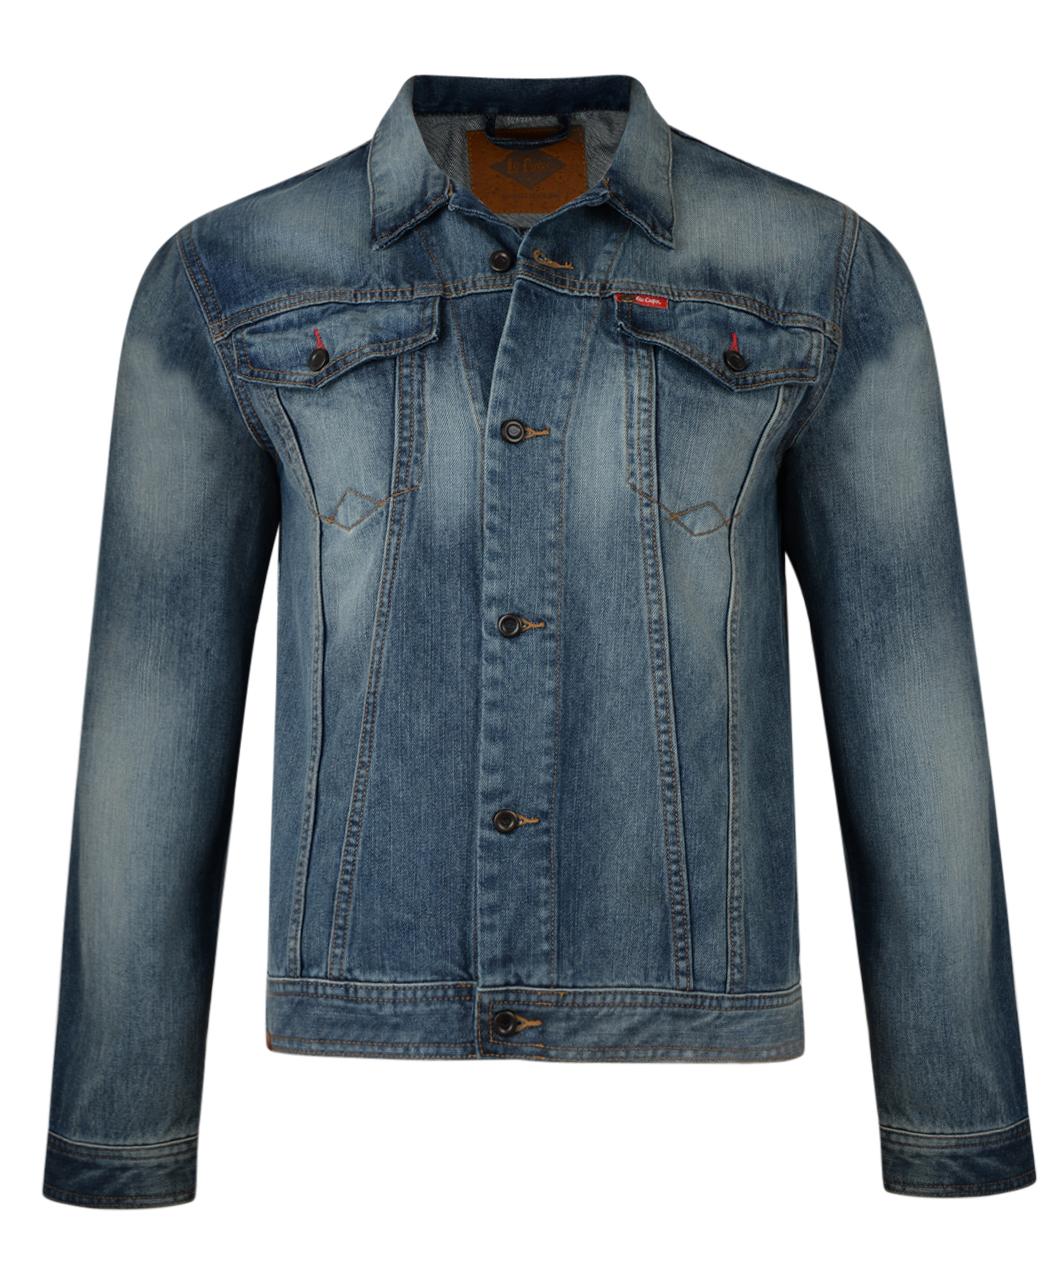 Lee Cooper New Menu2019s Denim Jacket Quality Vintage Retro Mod Trucker Jean Jackets | eBay